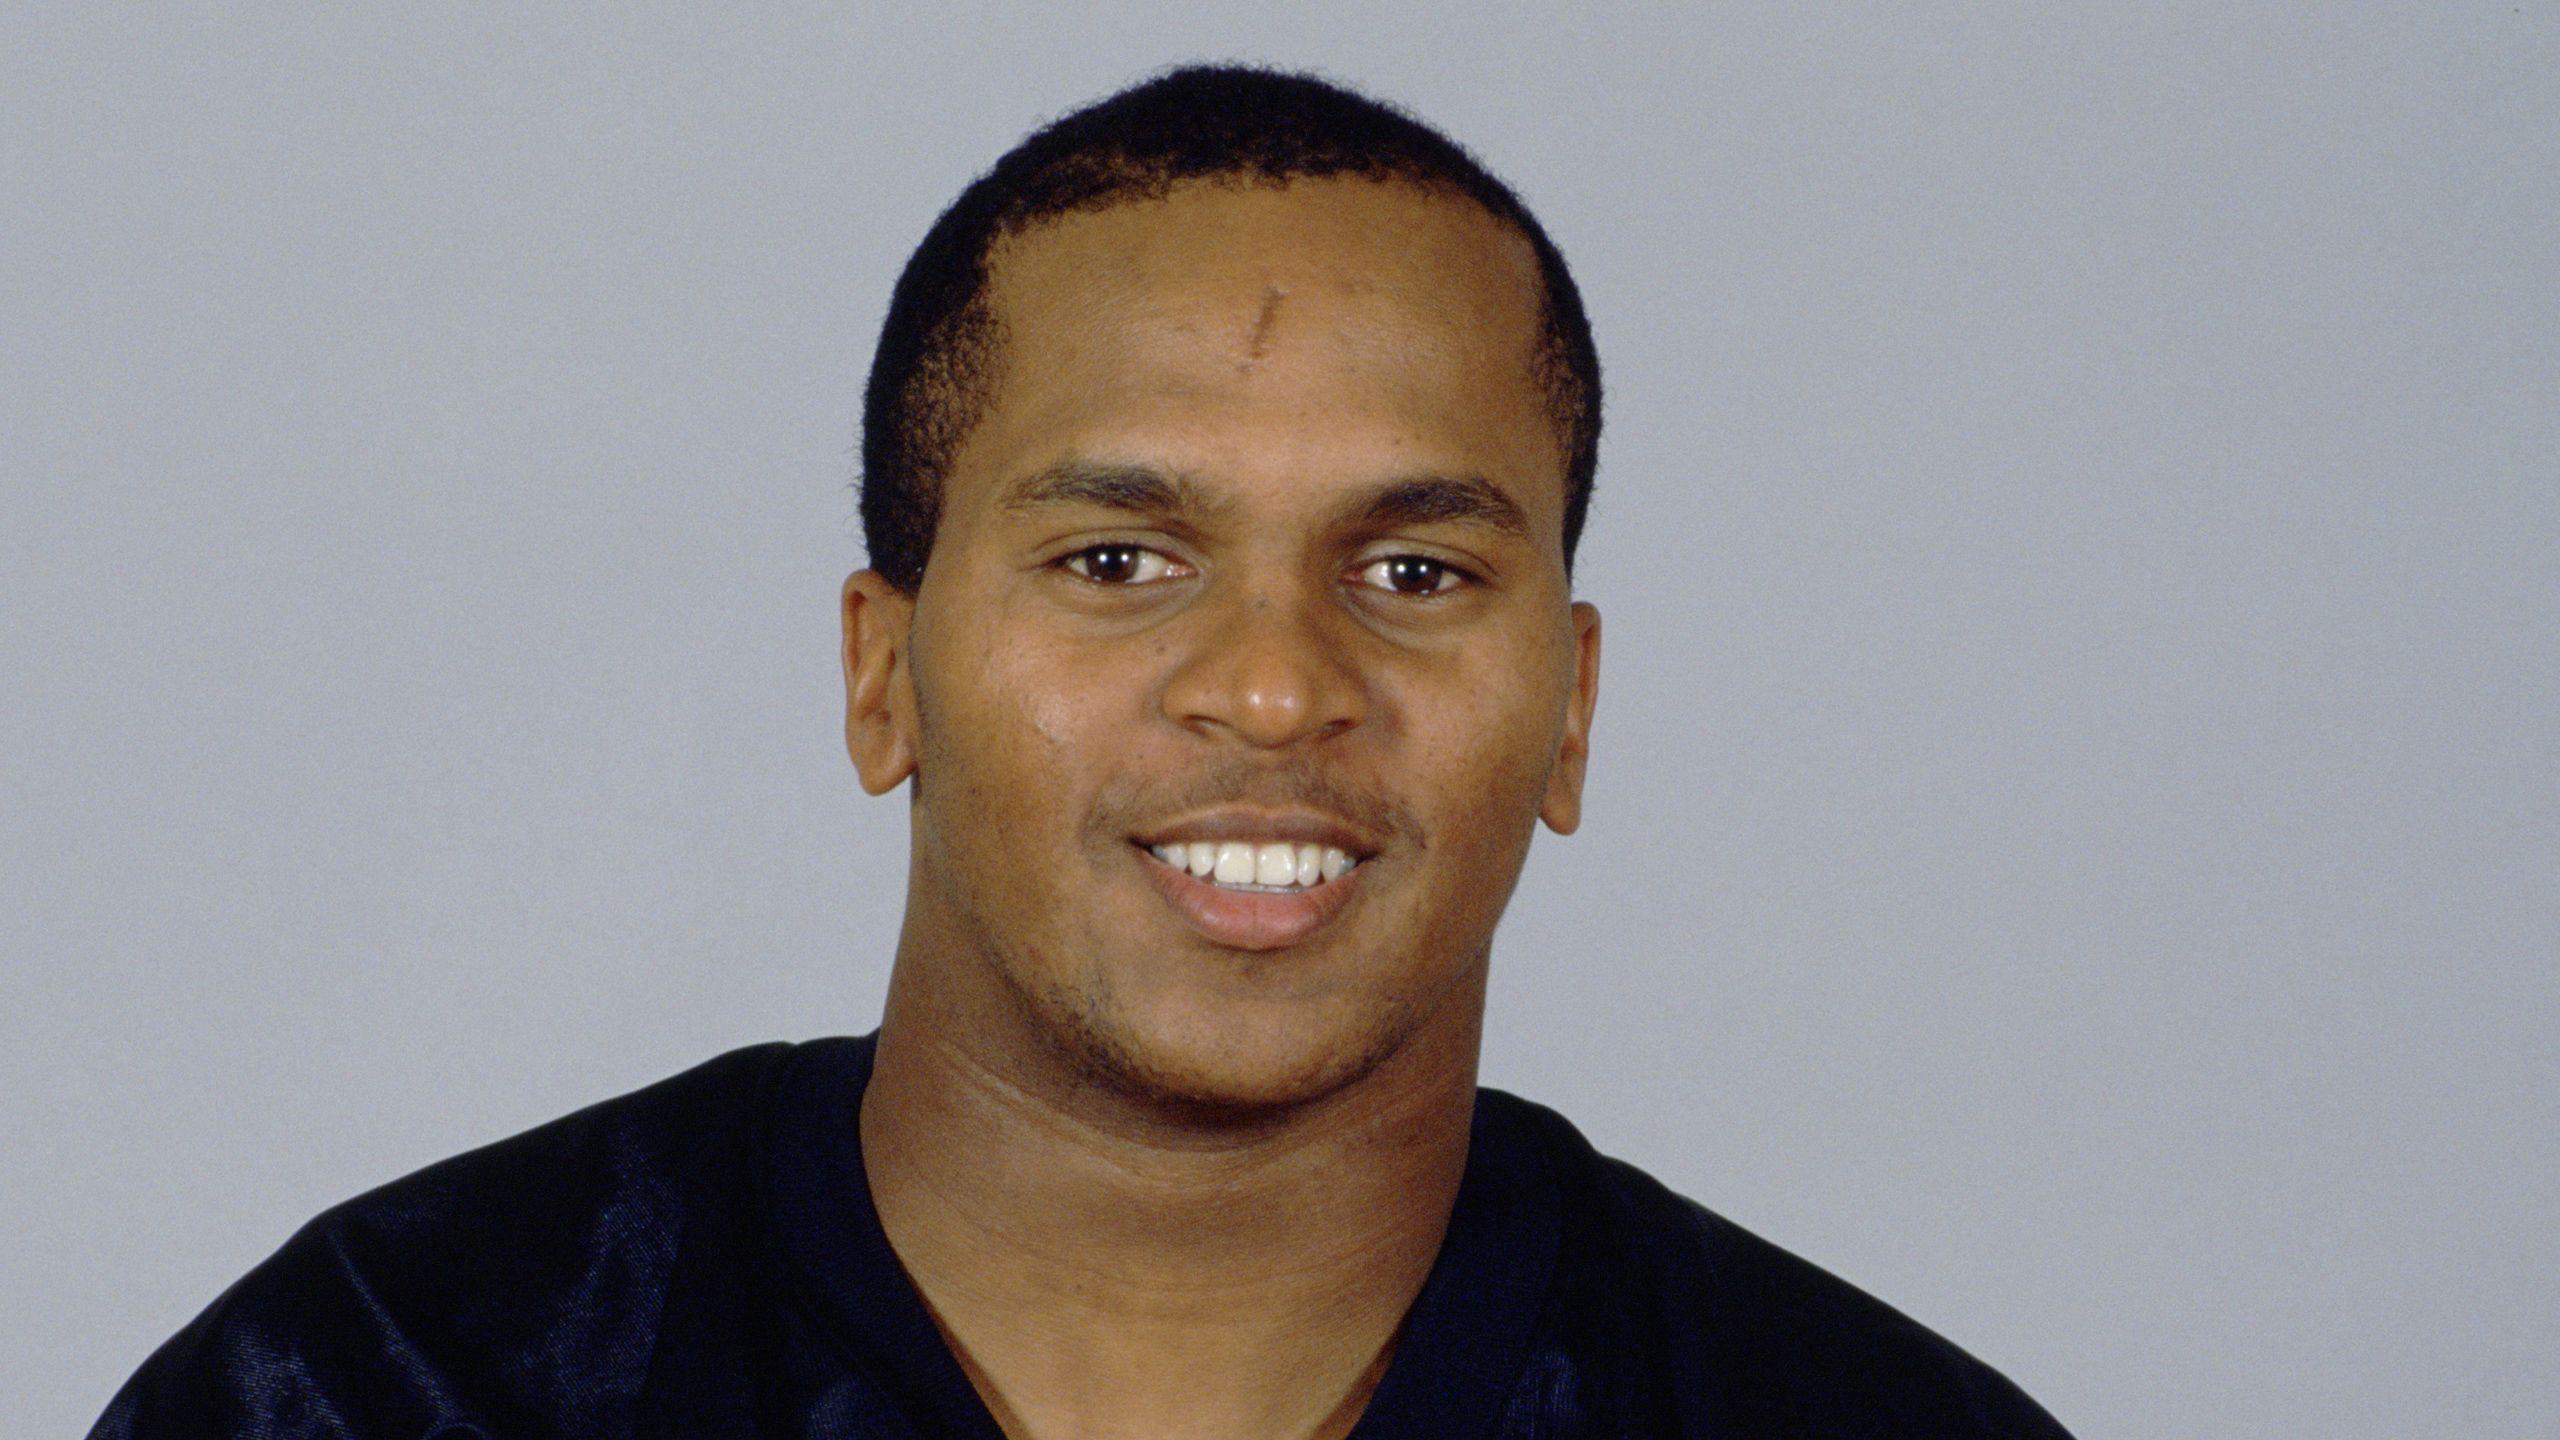 Derrick Crudup